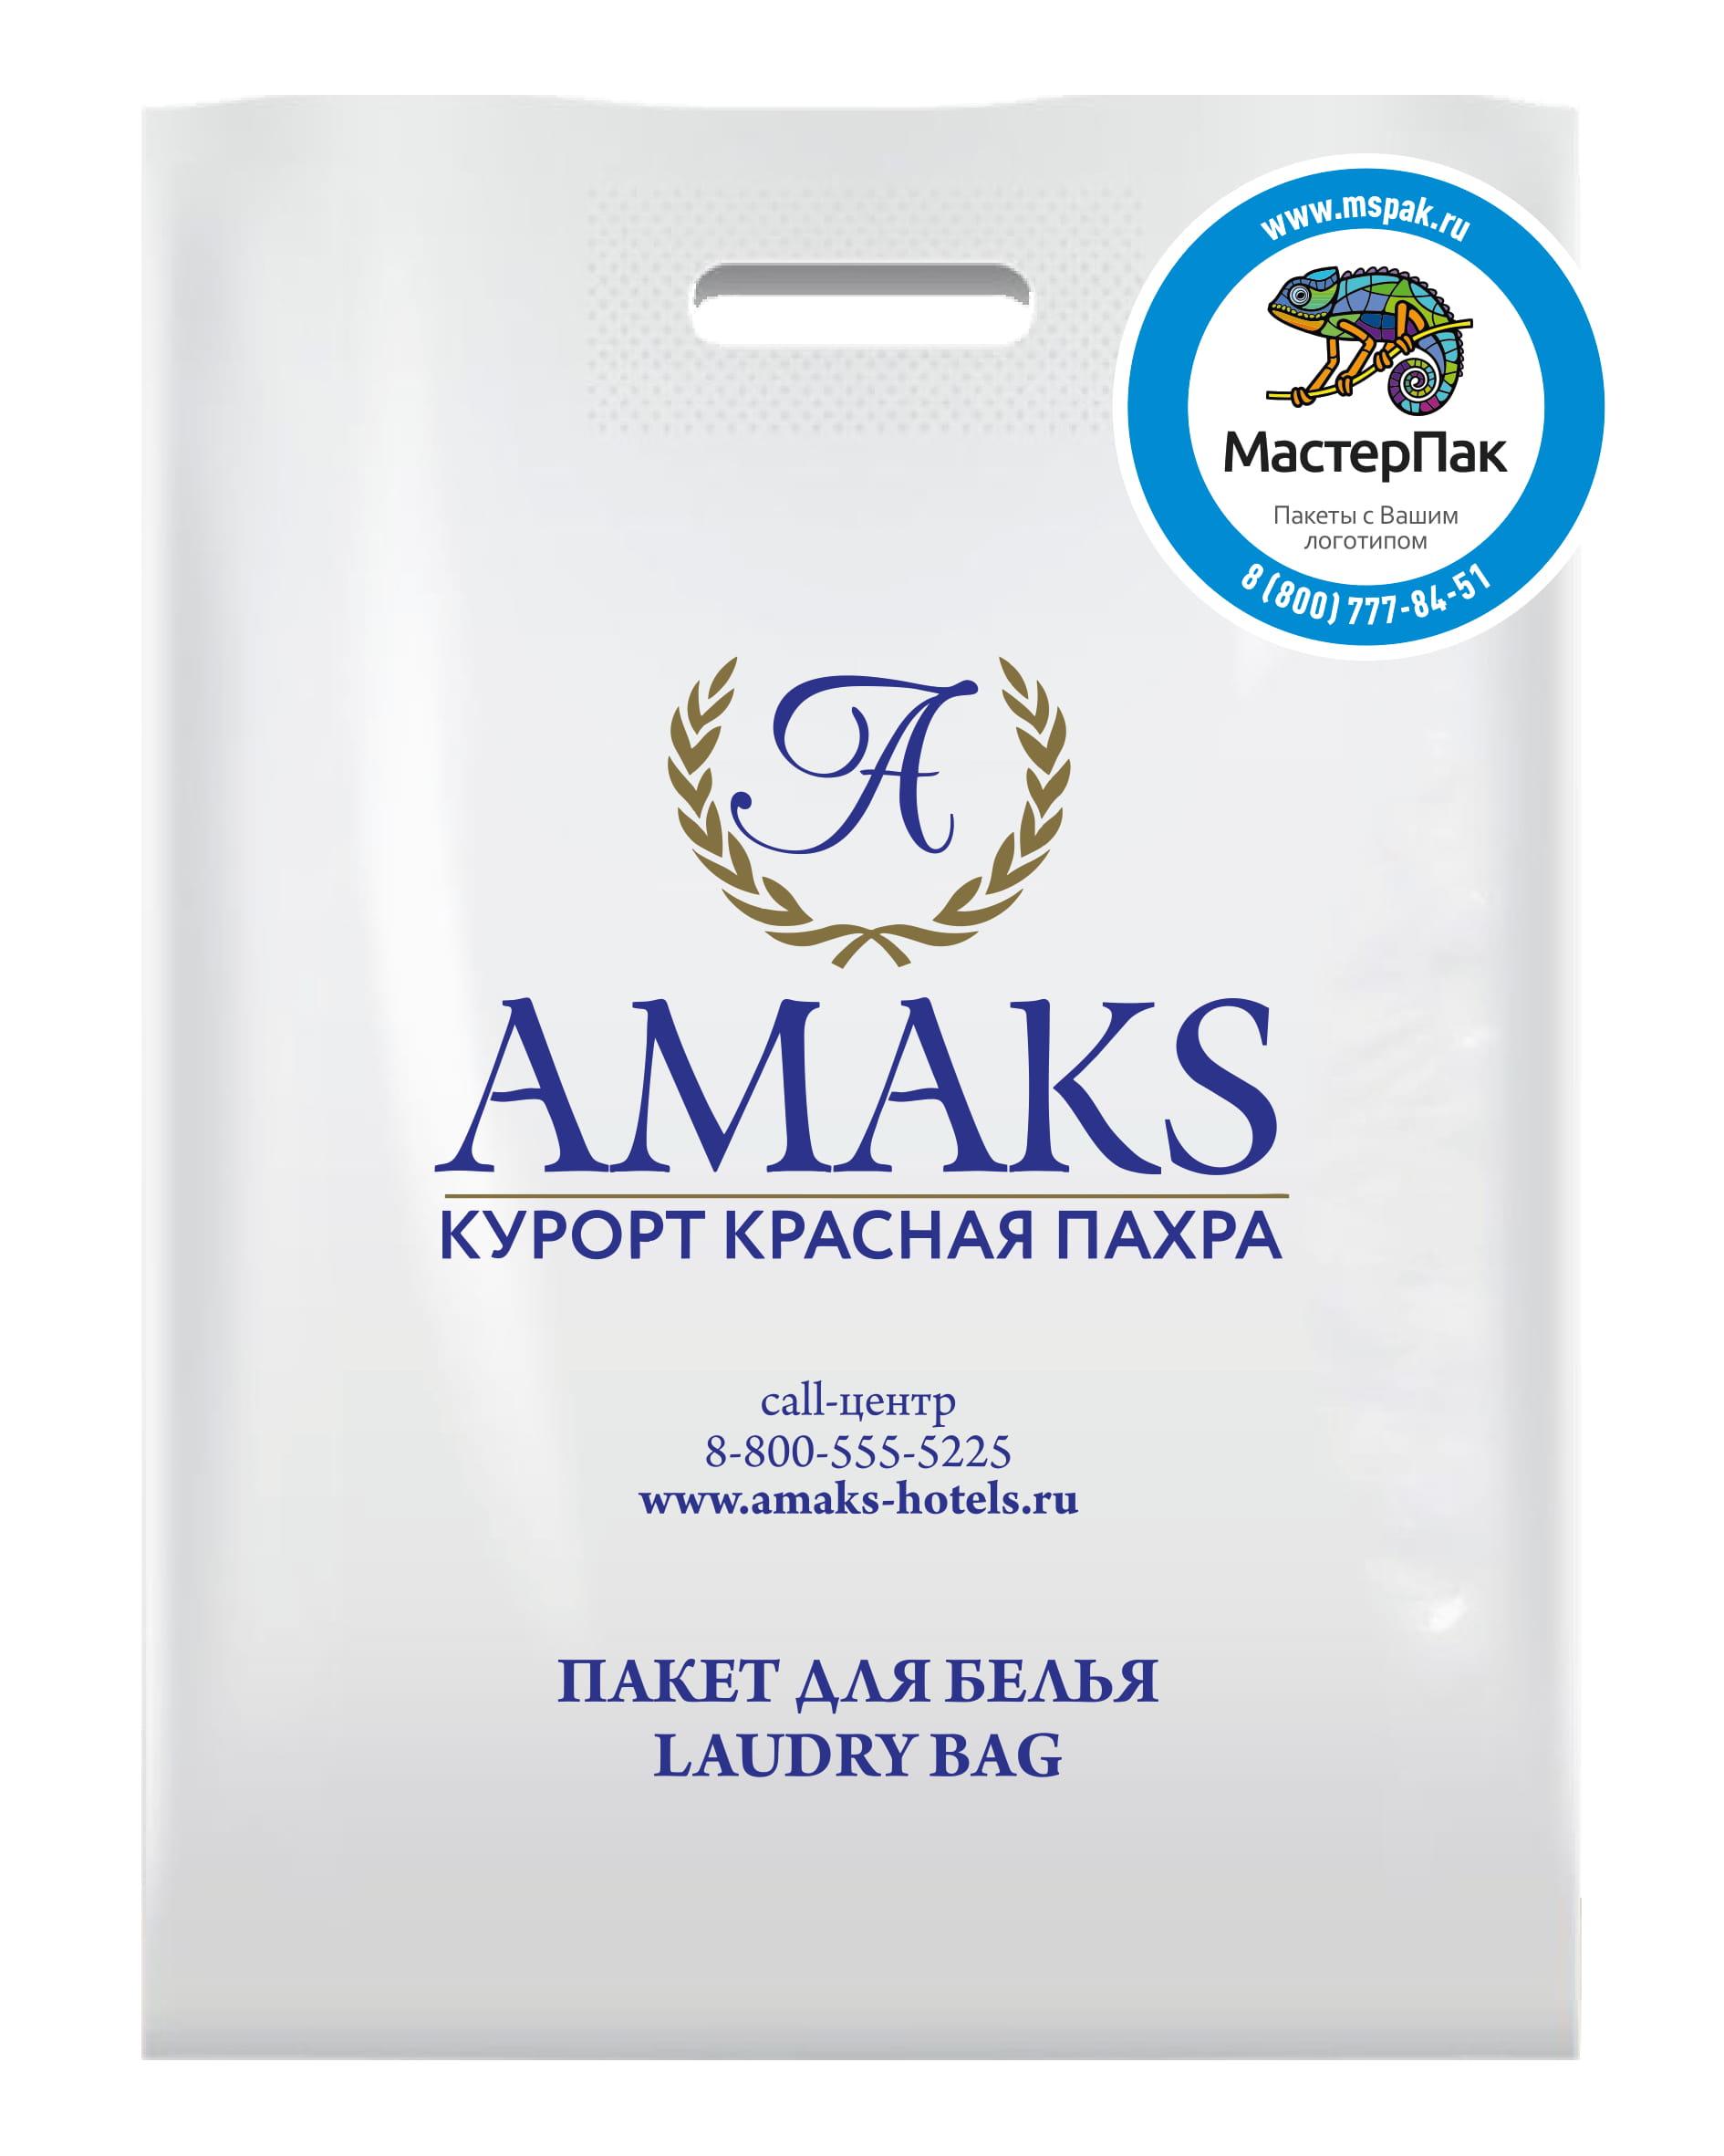 Пакет ПВД с логотипом AMAKS, Москва, 70 мкм, 30*40, белый